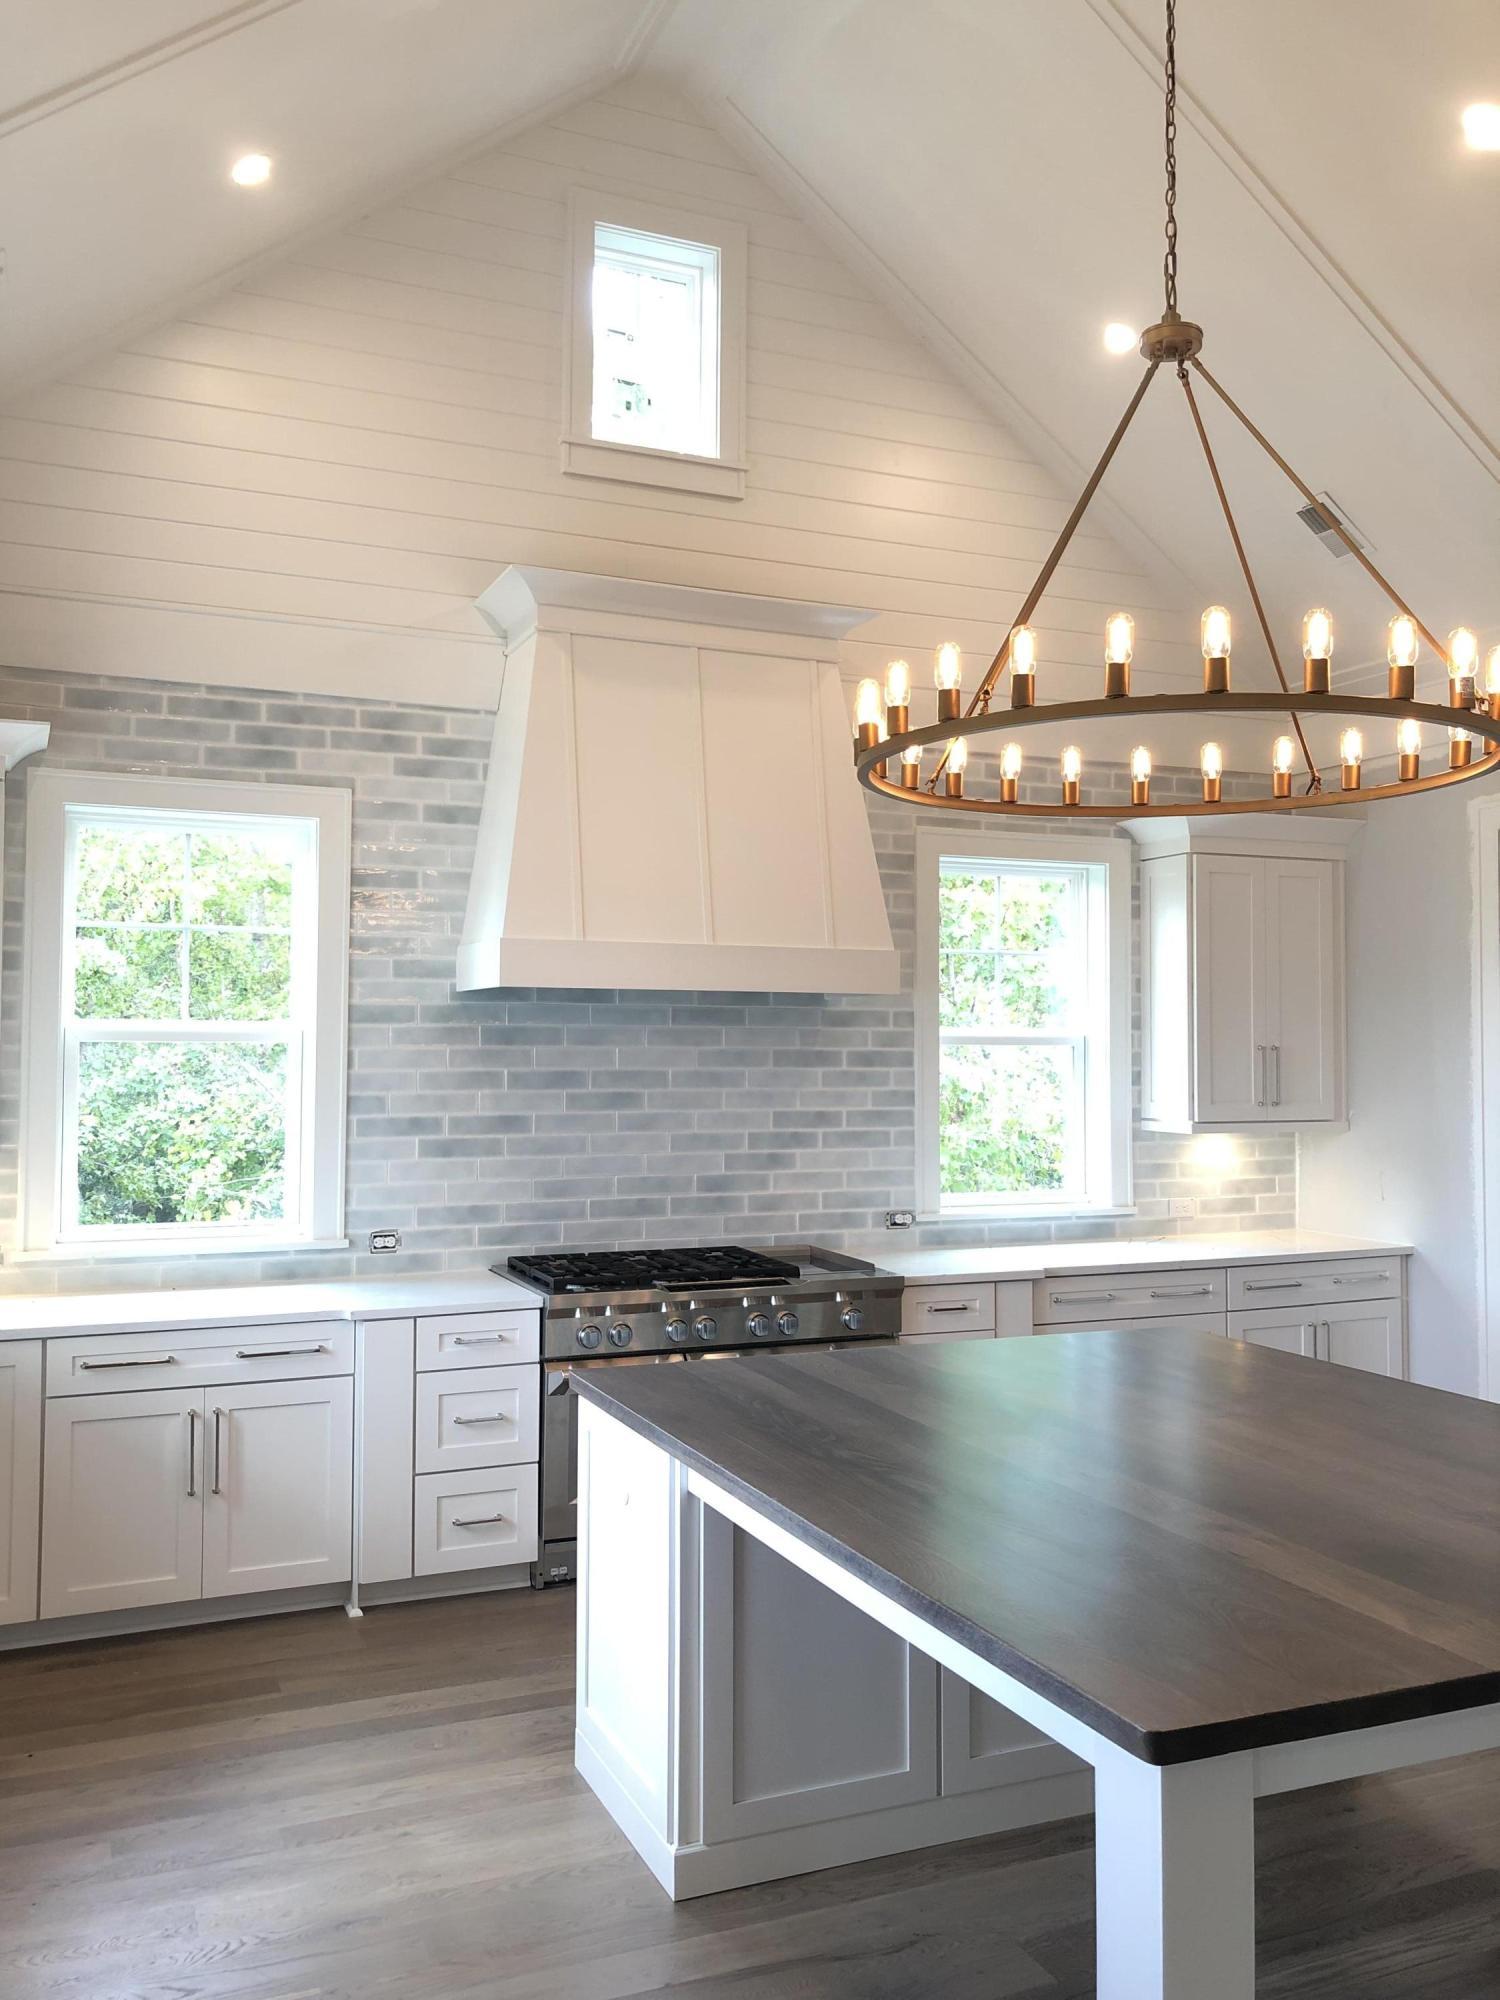 Carolina Park Homes For Sale - 1863 Bolden, Mount Pleasant, SC - 9